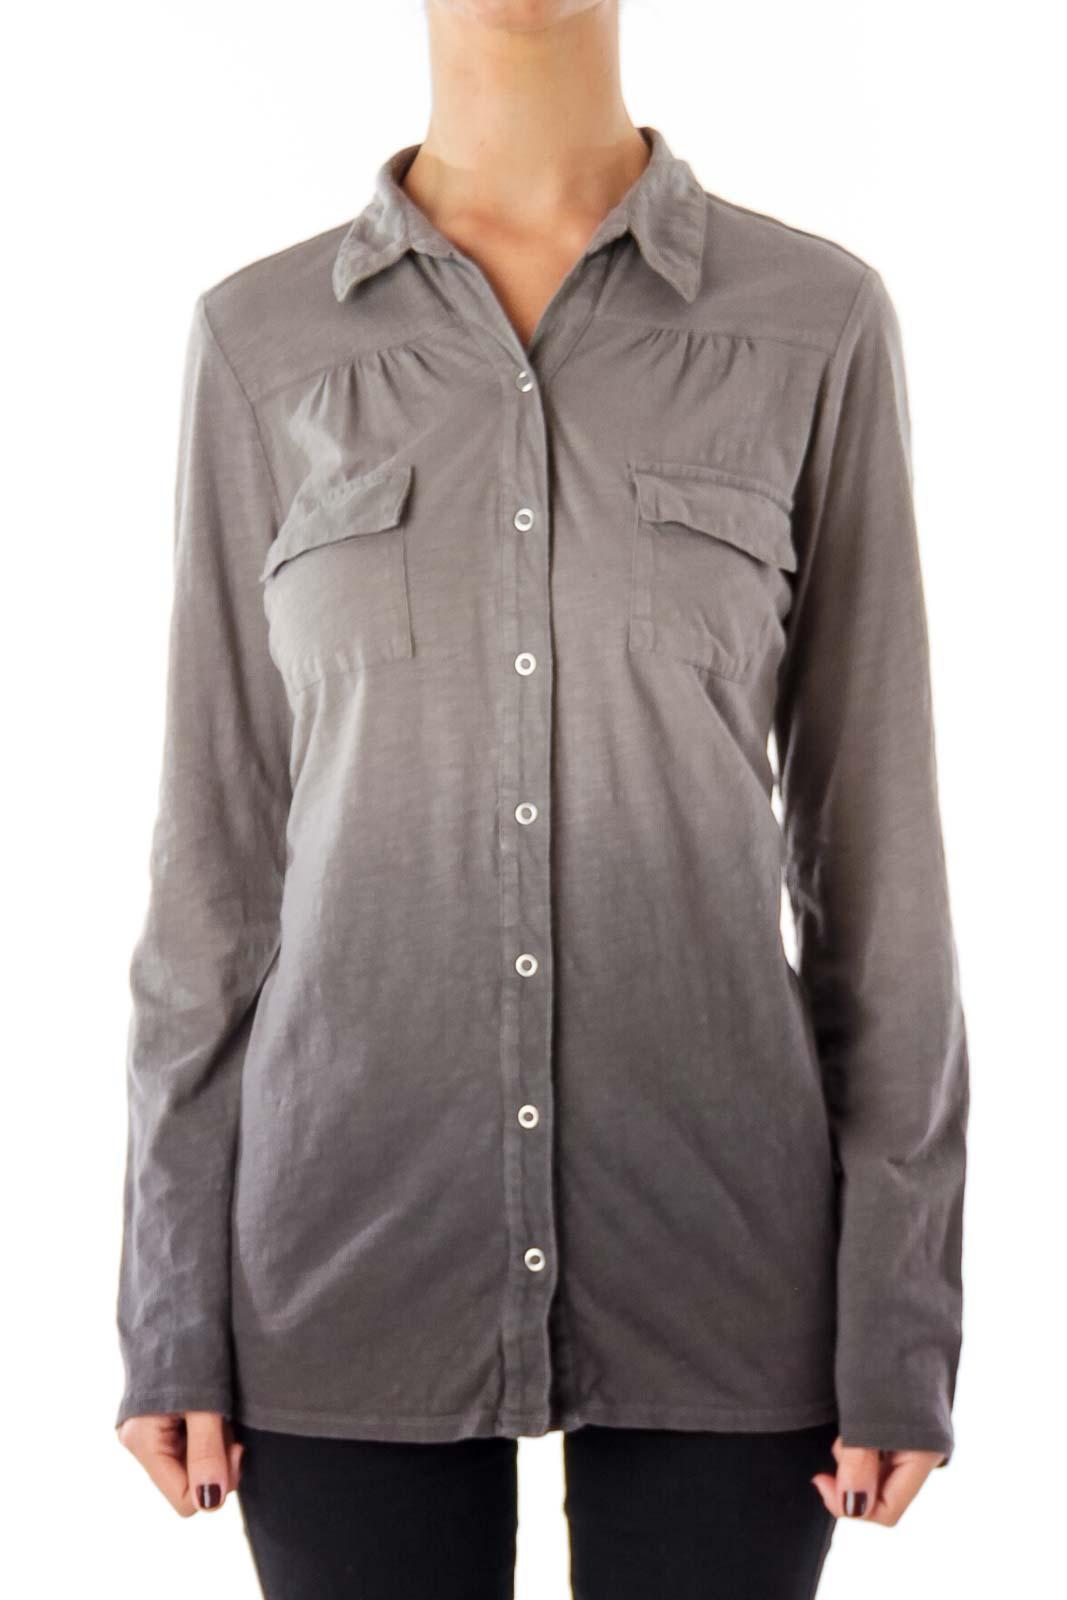 Gray Gradation Button Down Shirt Front